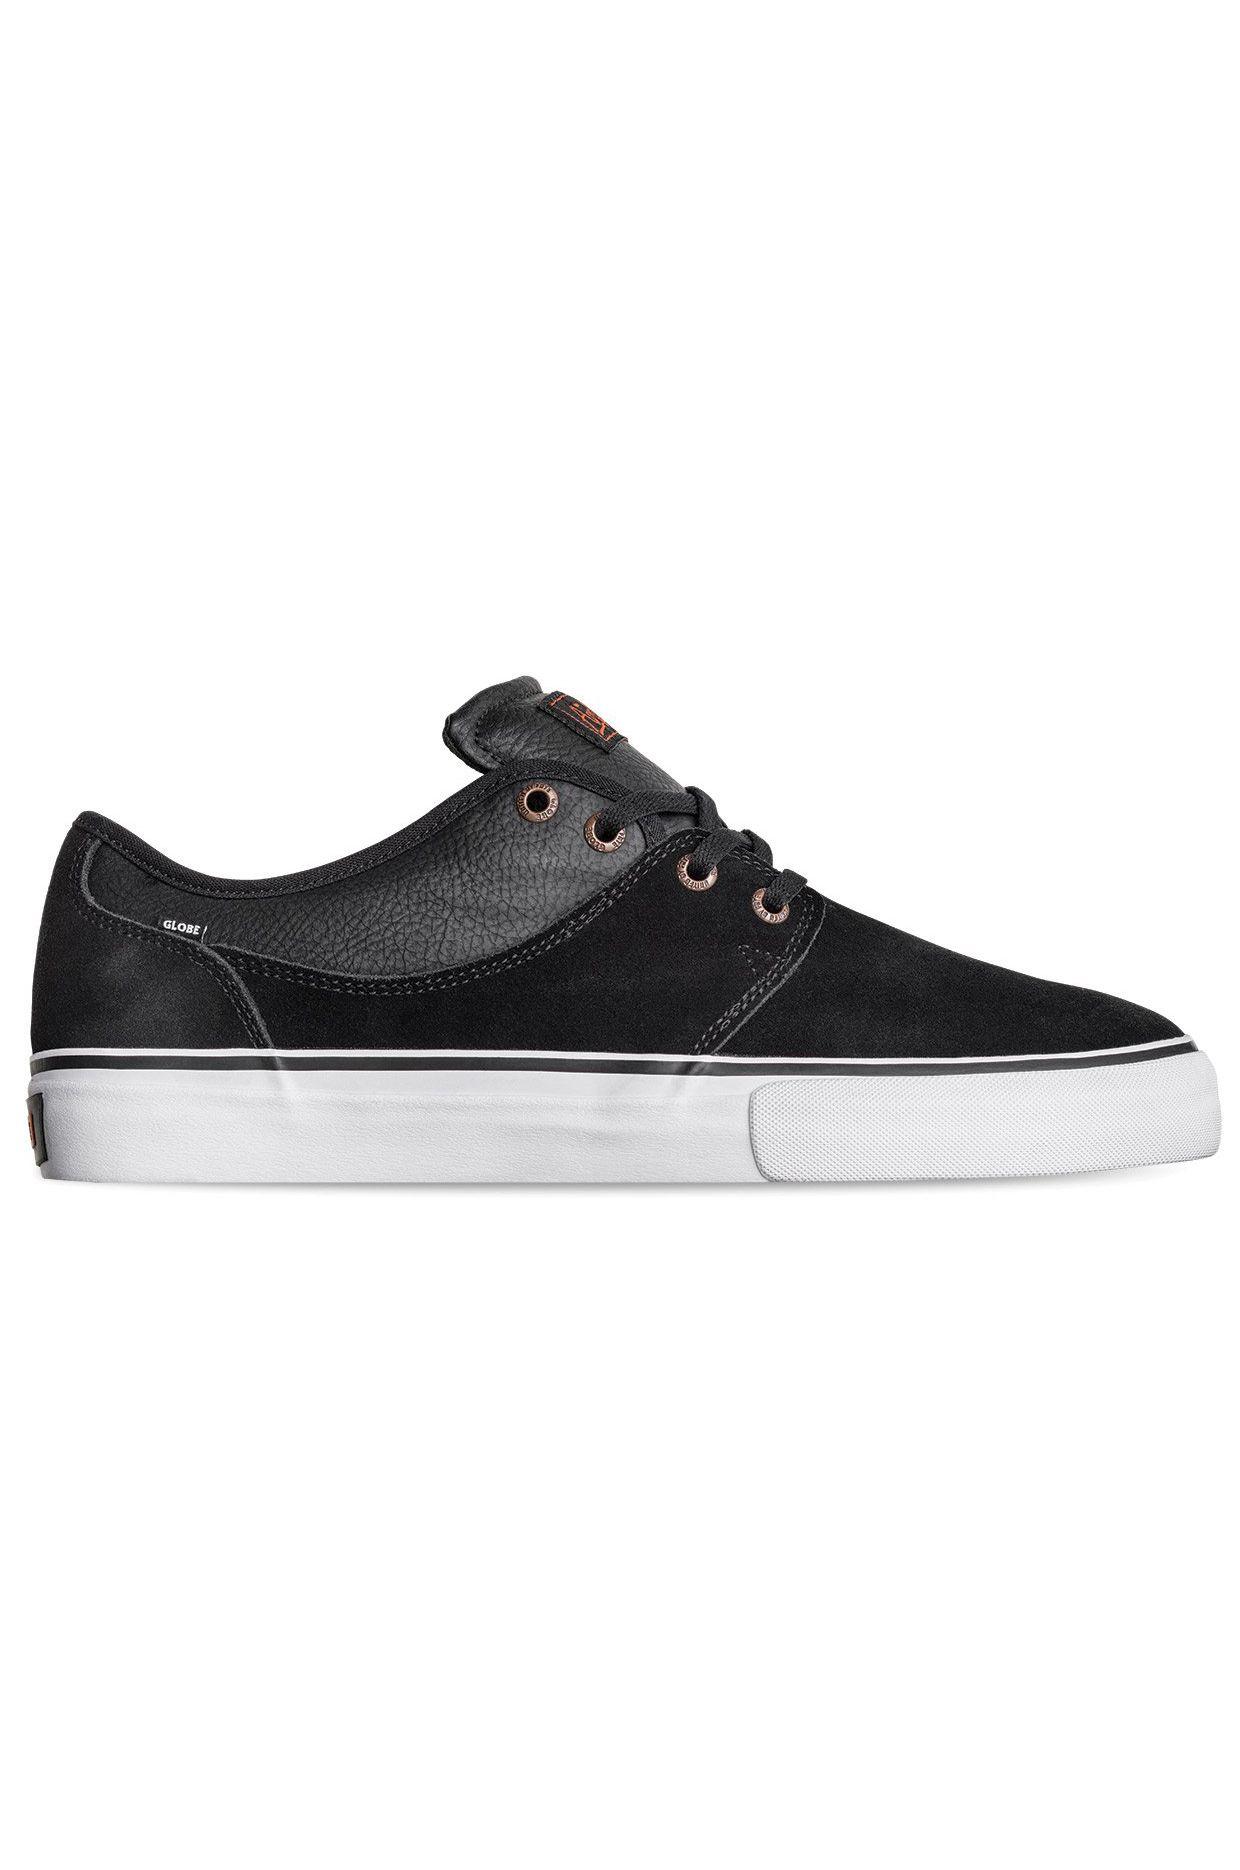 Globe Shoes MAHALO Black/White/Copper